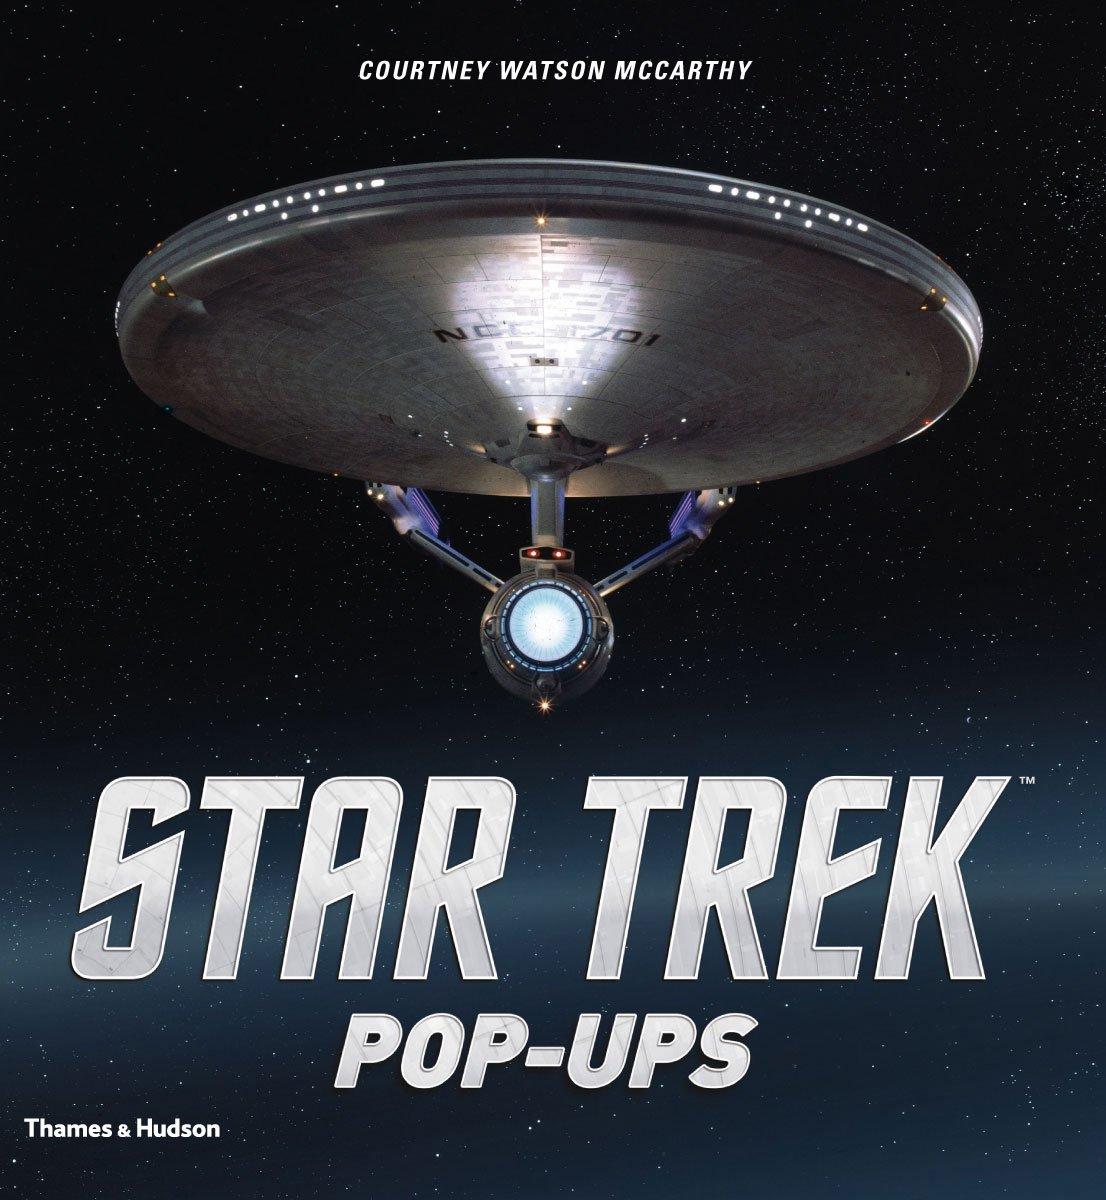 Star Trek Pop-Ups 2016 latest arrival cool bronze pocket watch star trek movies extension birthday new year gift